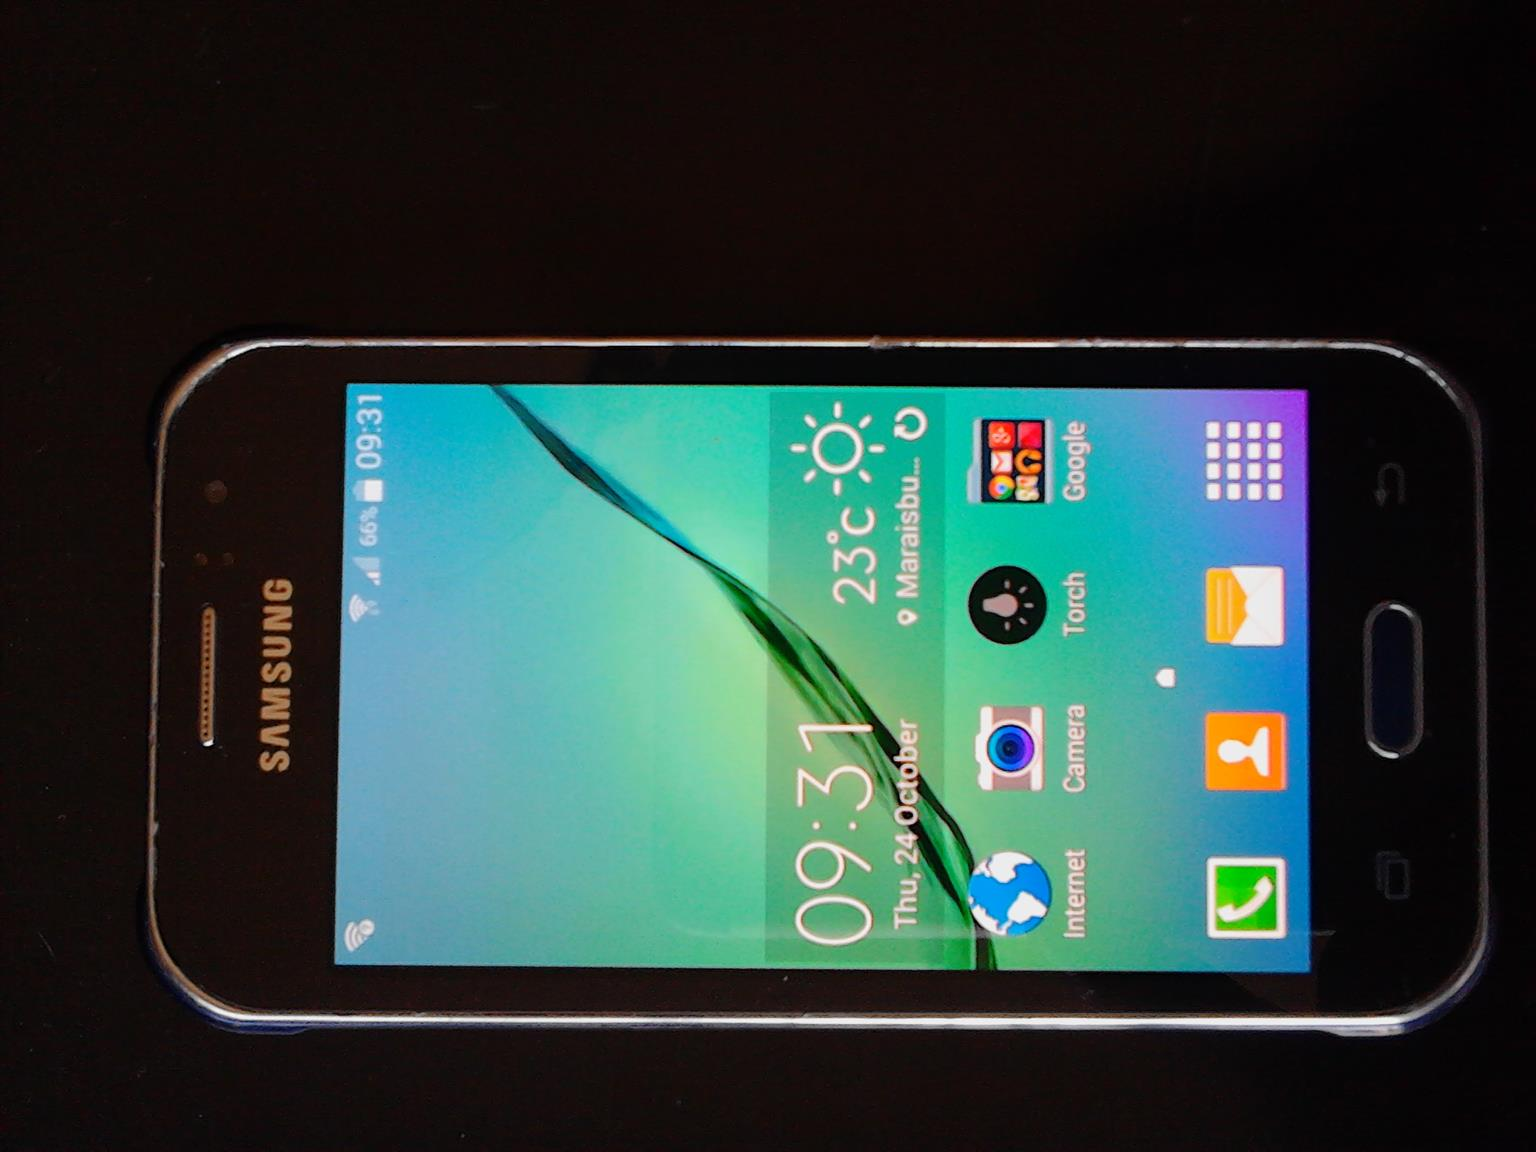 Samsung J1 Ace SM-J110F